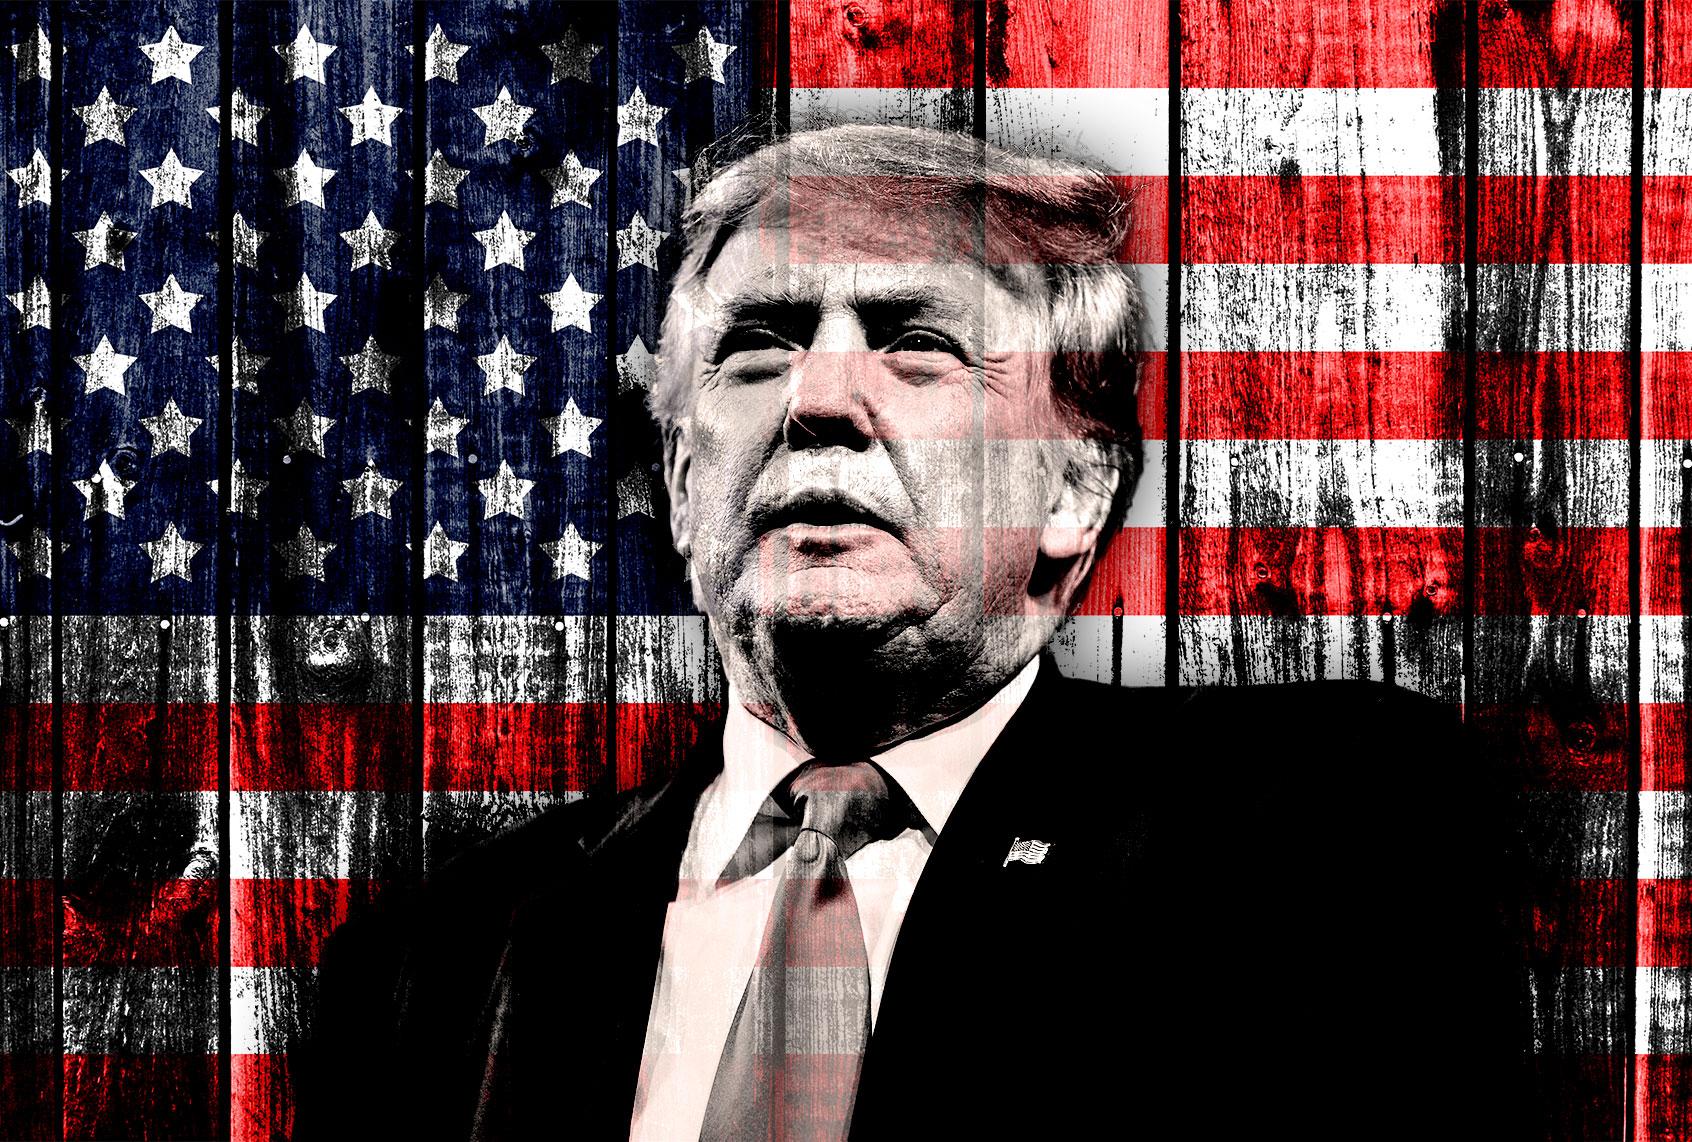 donald-trump-faded-american-flag-0718211